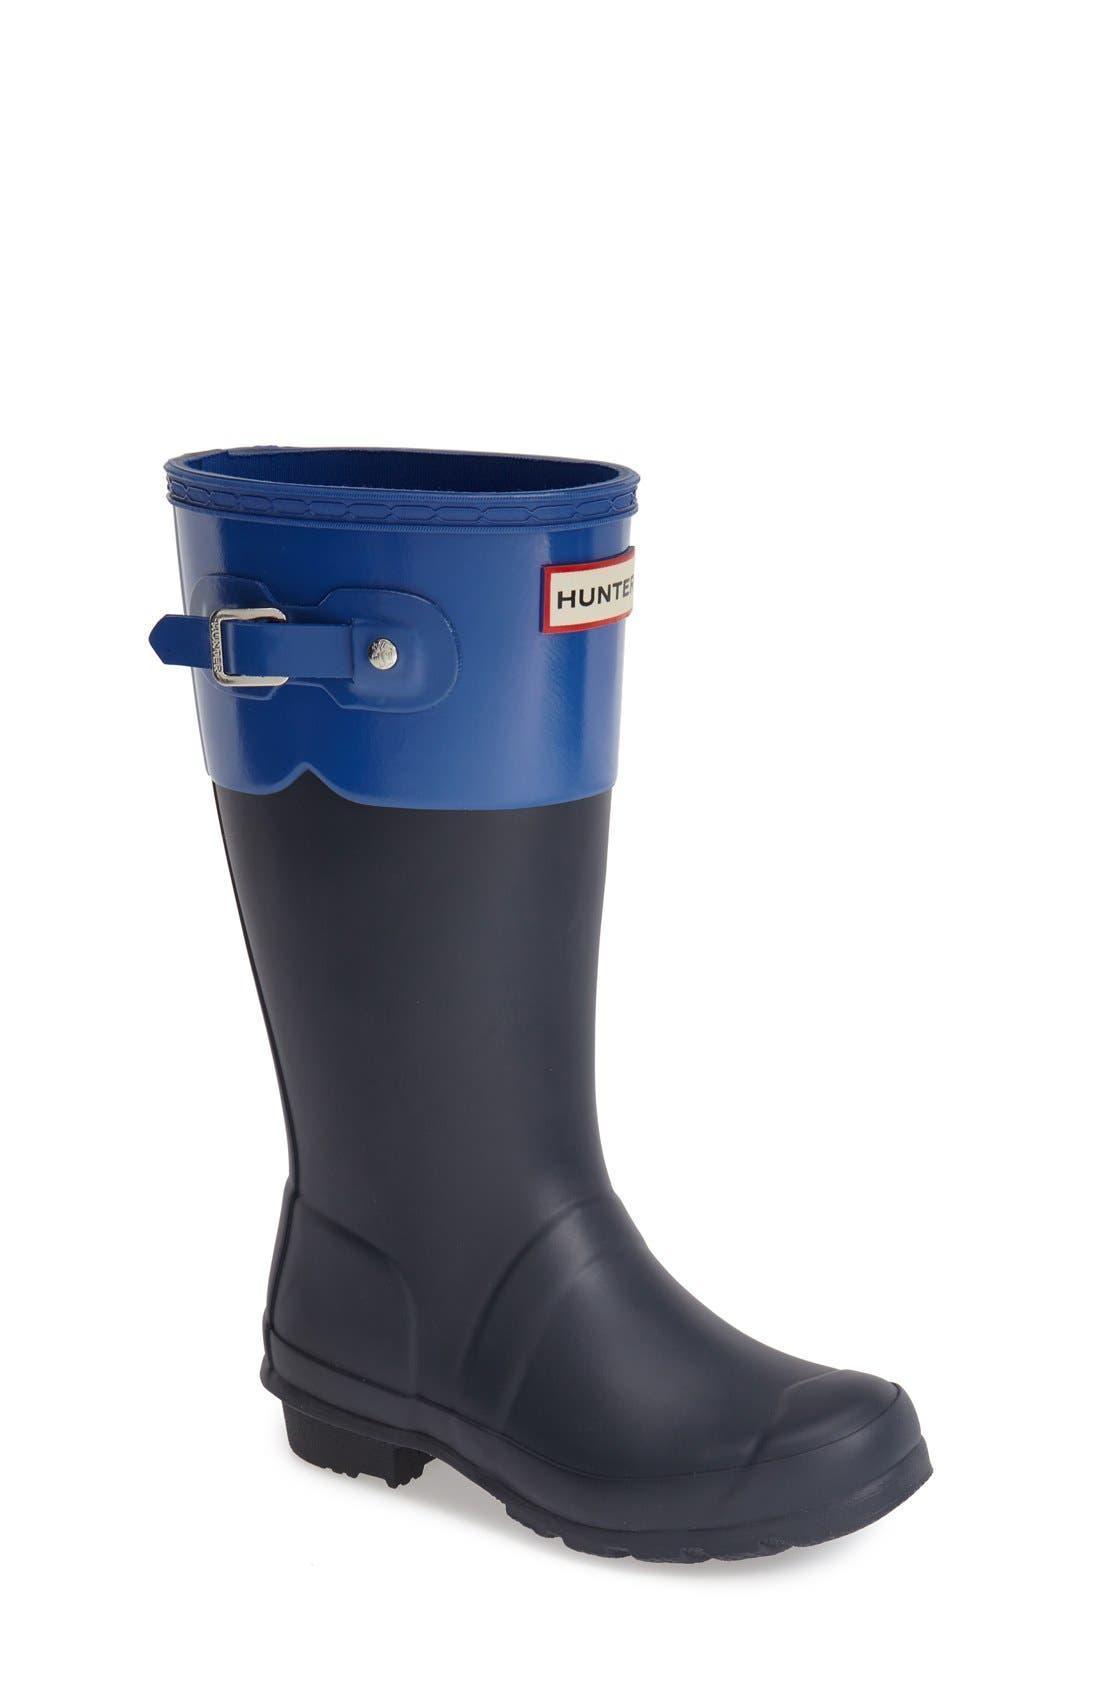 HUNTER 'Original Tonal' Rain Boot, Main, color, 410